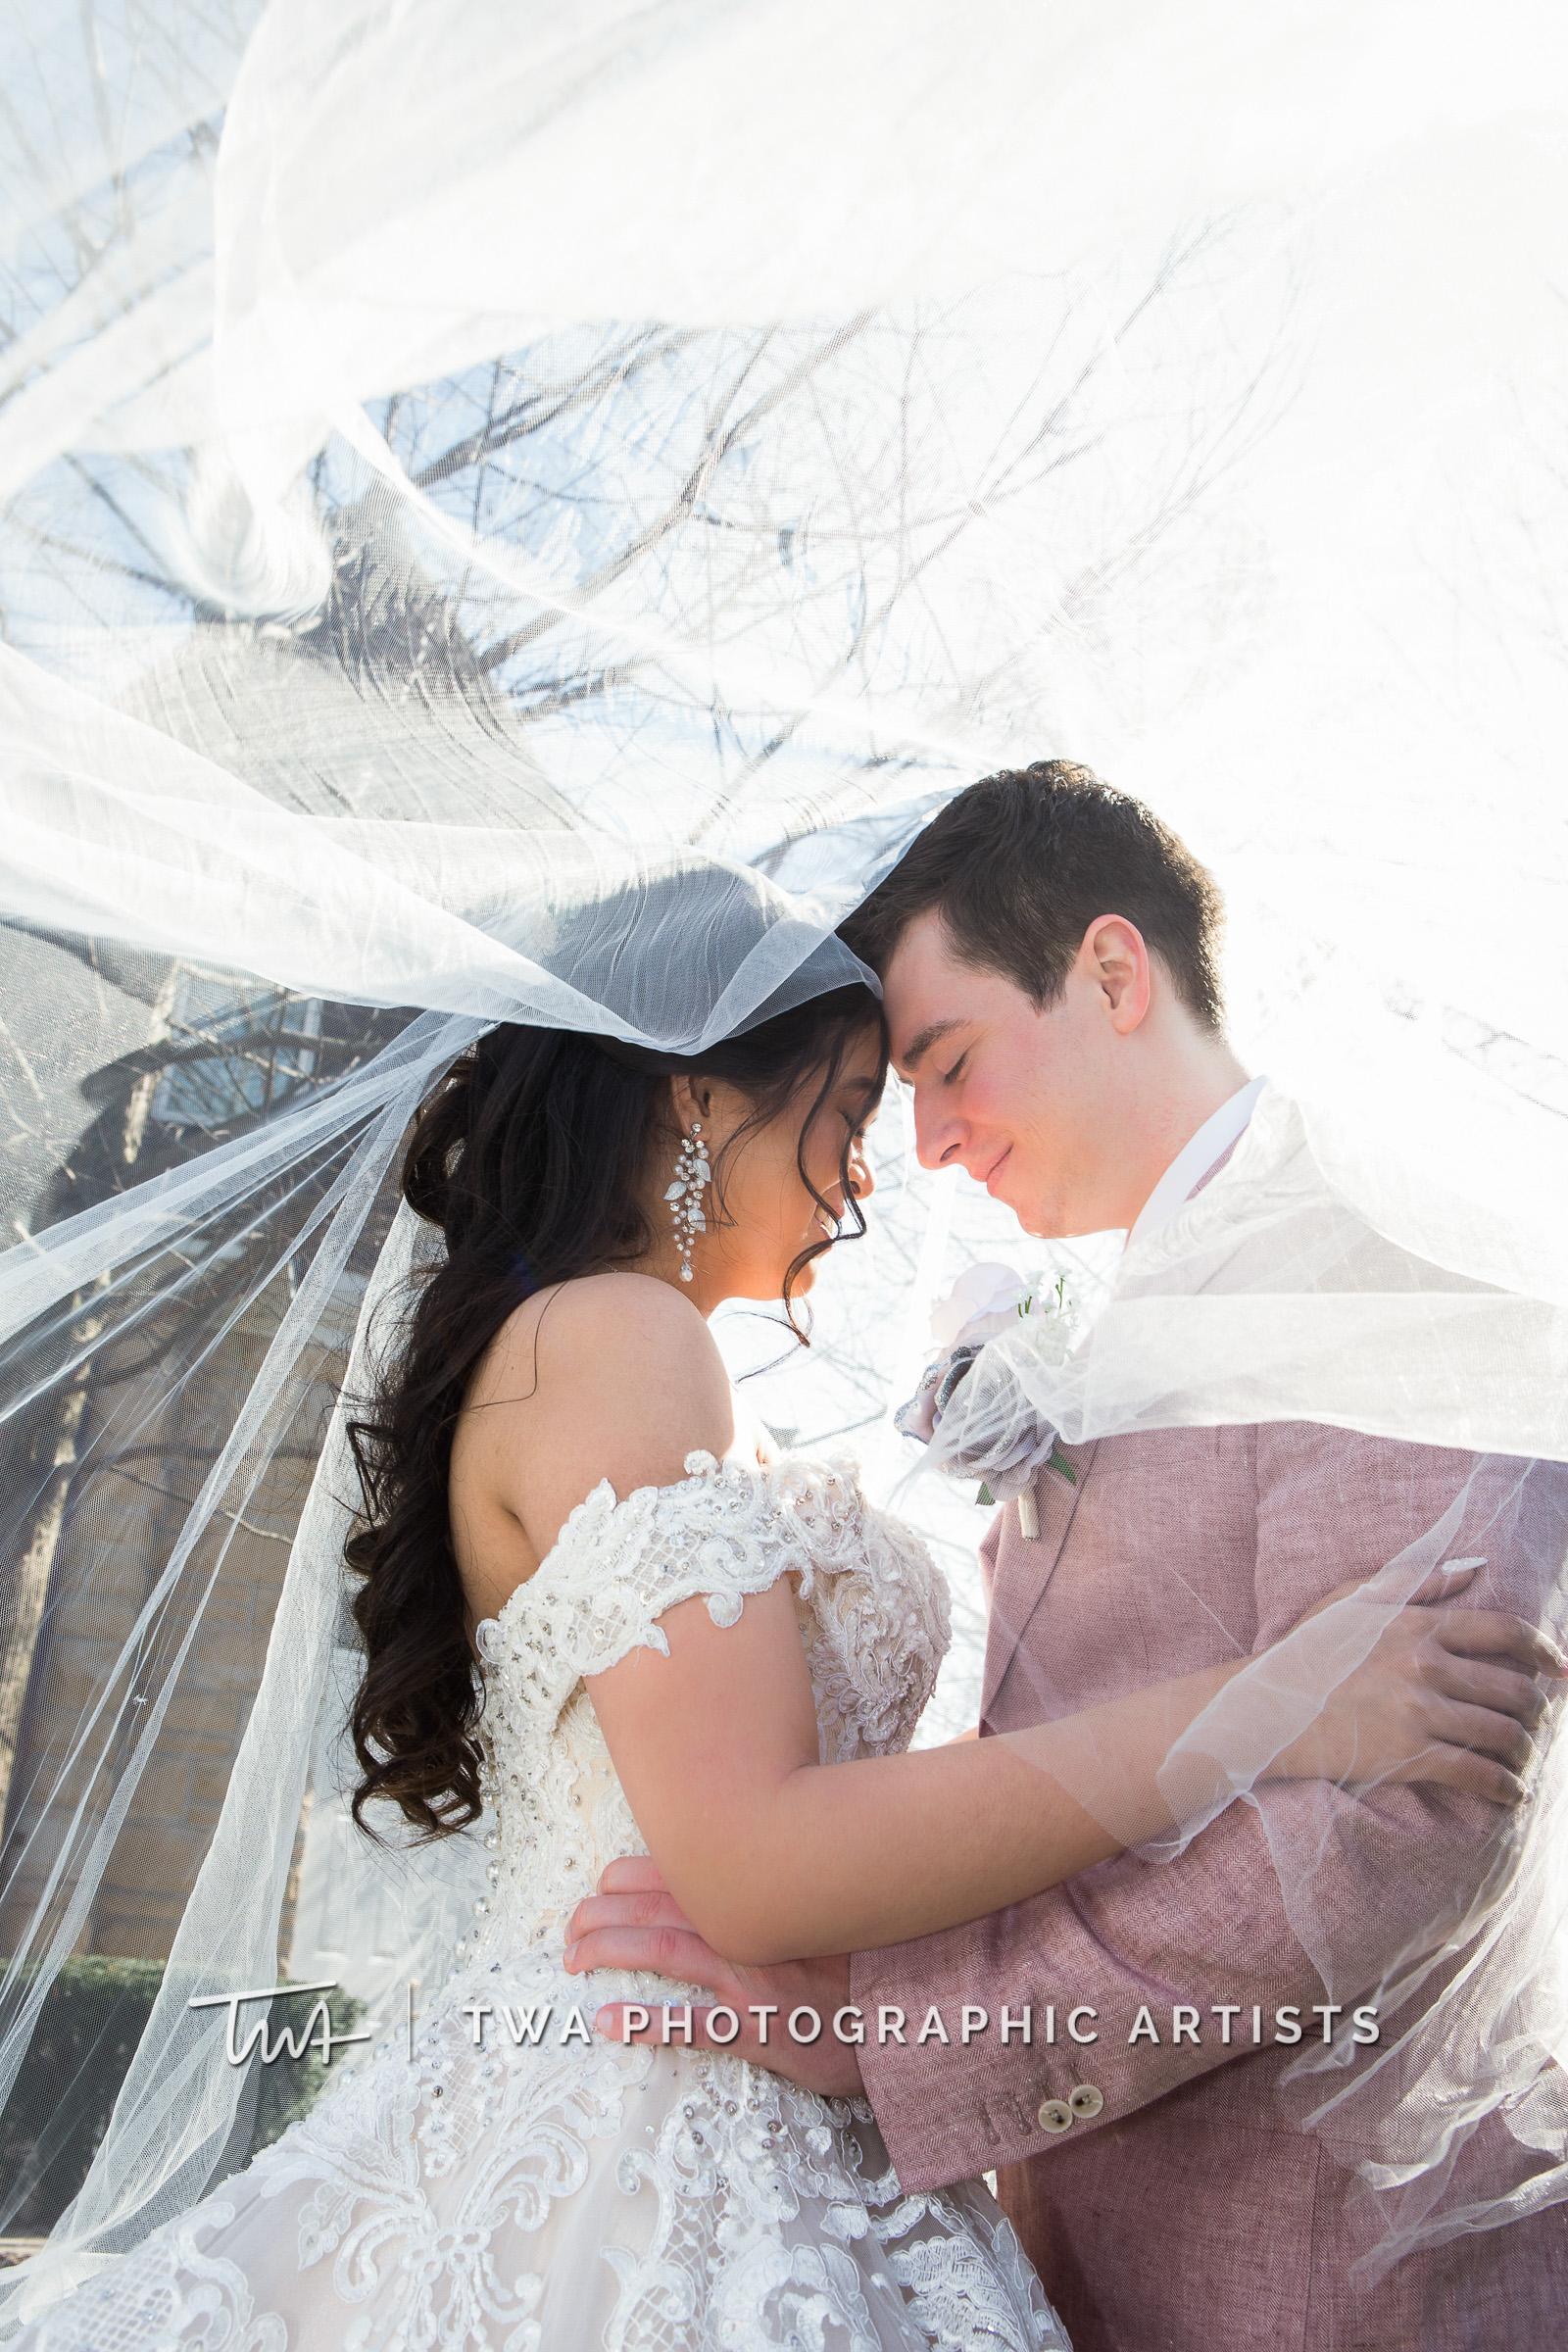 Isabella & Hunter | TWA Photography Reviews | Chicago Wedding Photographers